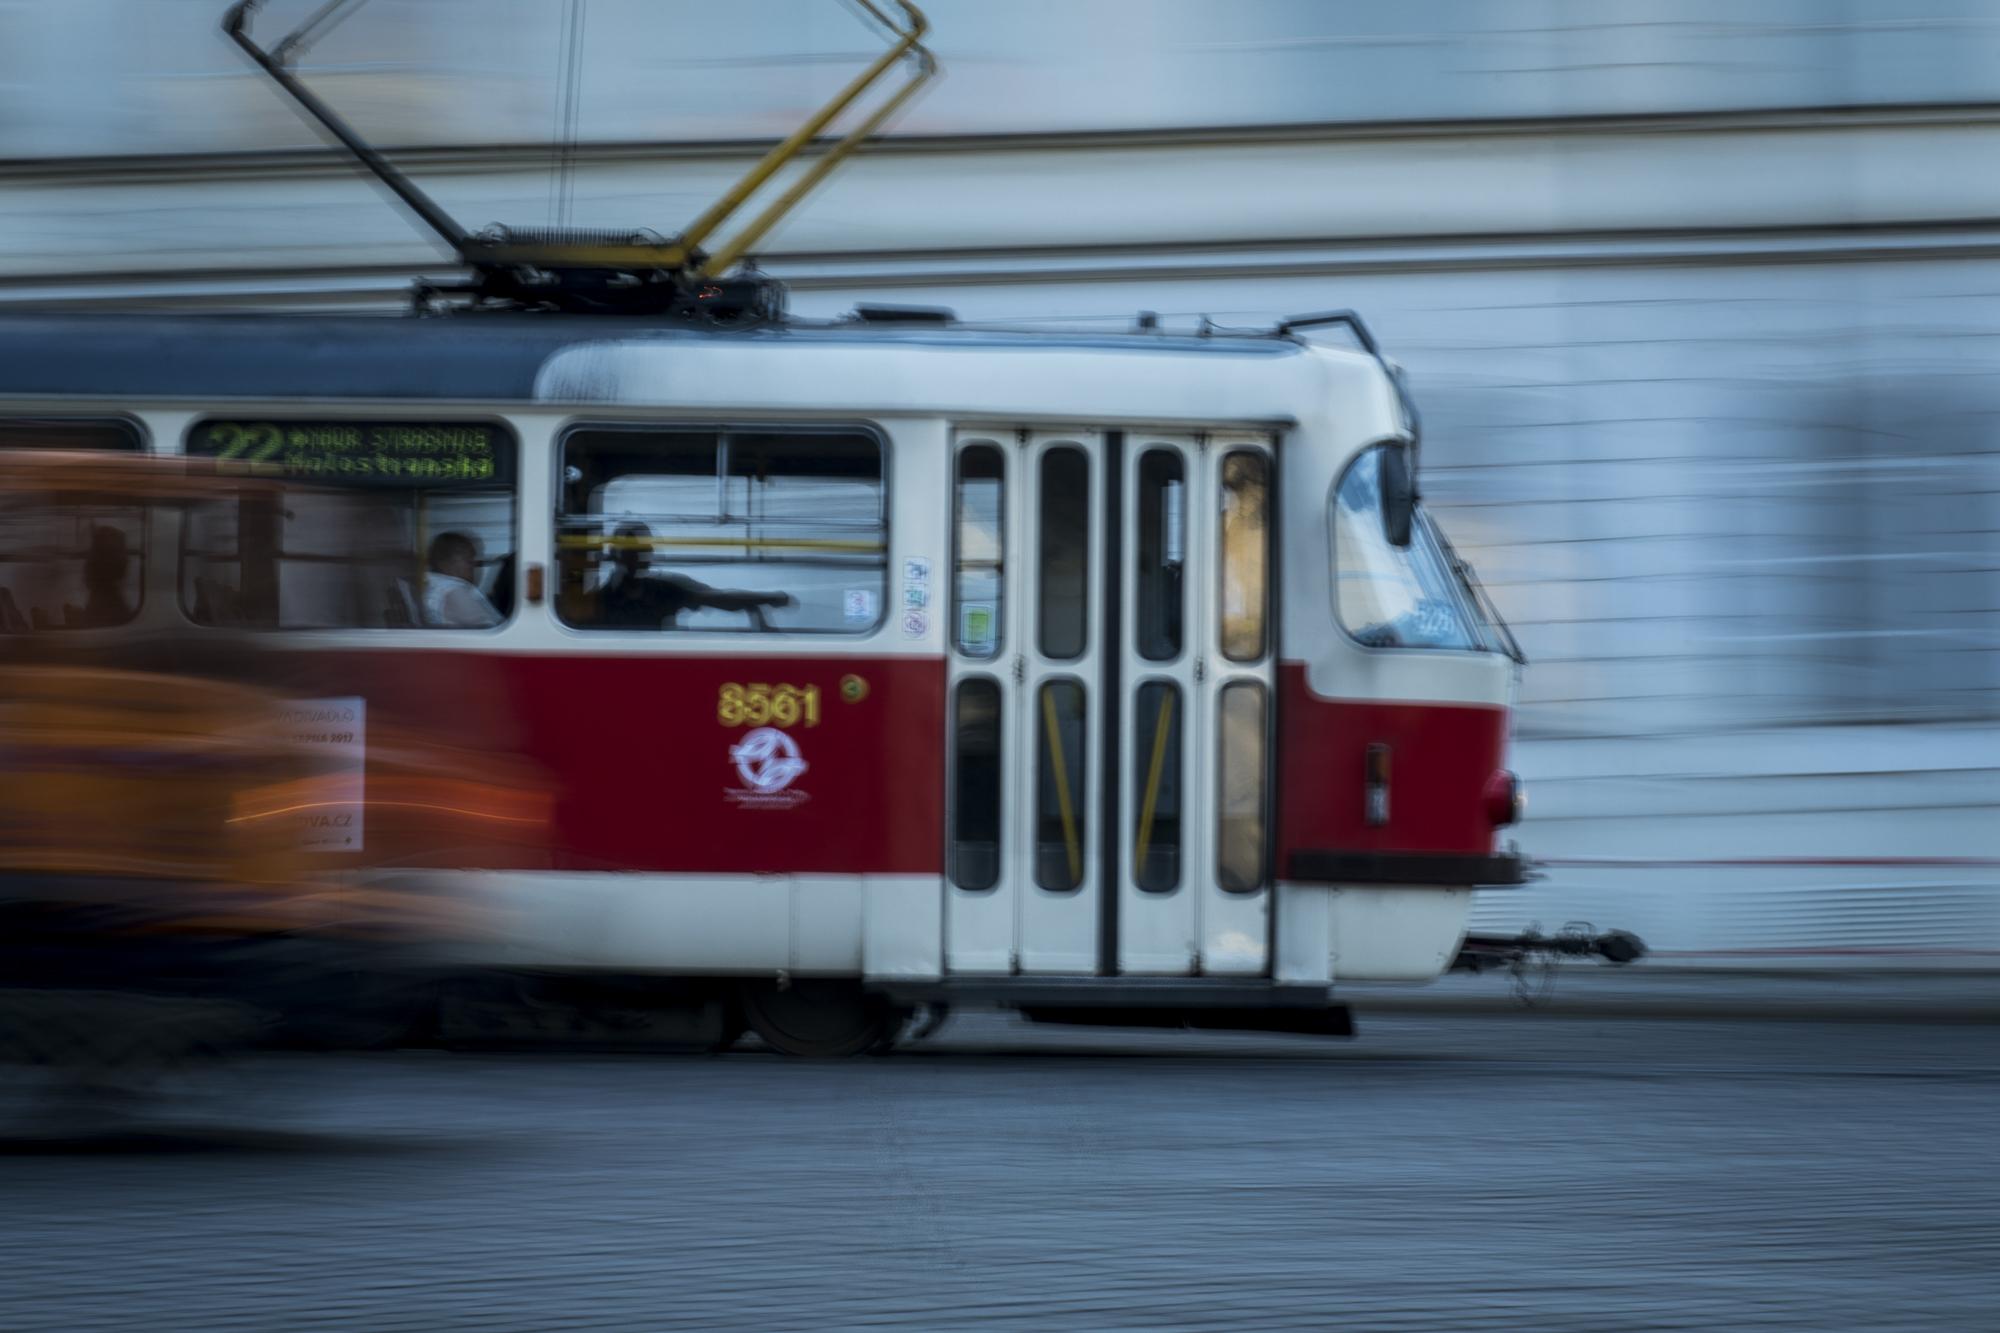 Prague TatrA T3 tram (on a tripod)  PHOTOGRAPHY: ALEXANDER J.E. BRADLEY • NIKON D500 • AF-S NIKKOR 24-70MM Ƒ/2.8G ED @ 70MM • Ƒ/22 • 1/5• ISO 50